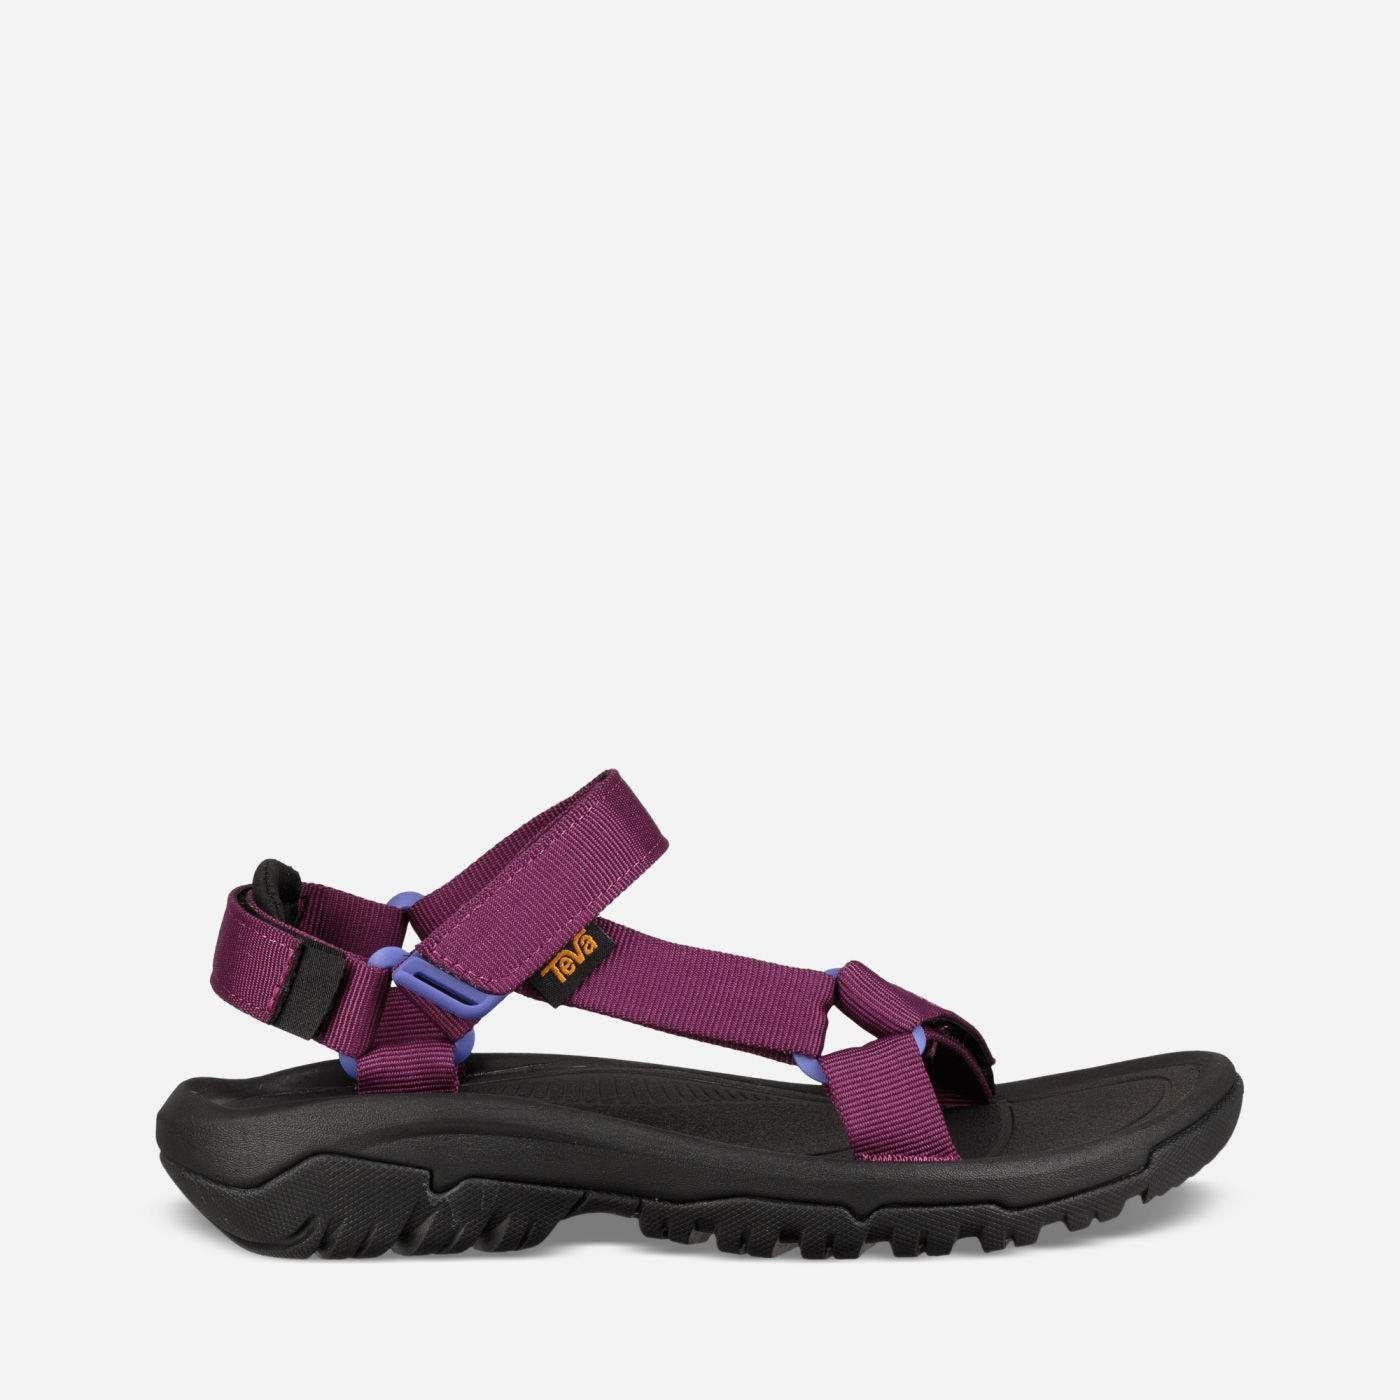 Hurricane Xlt2 Womens Sandals Sandals Iconic Women